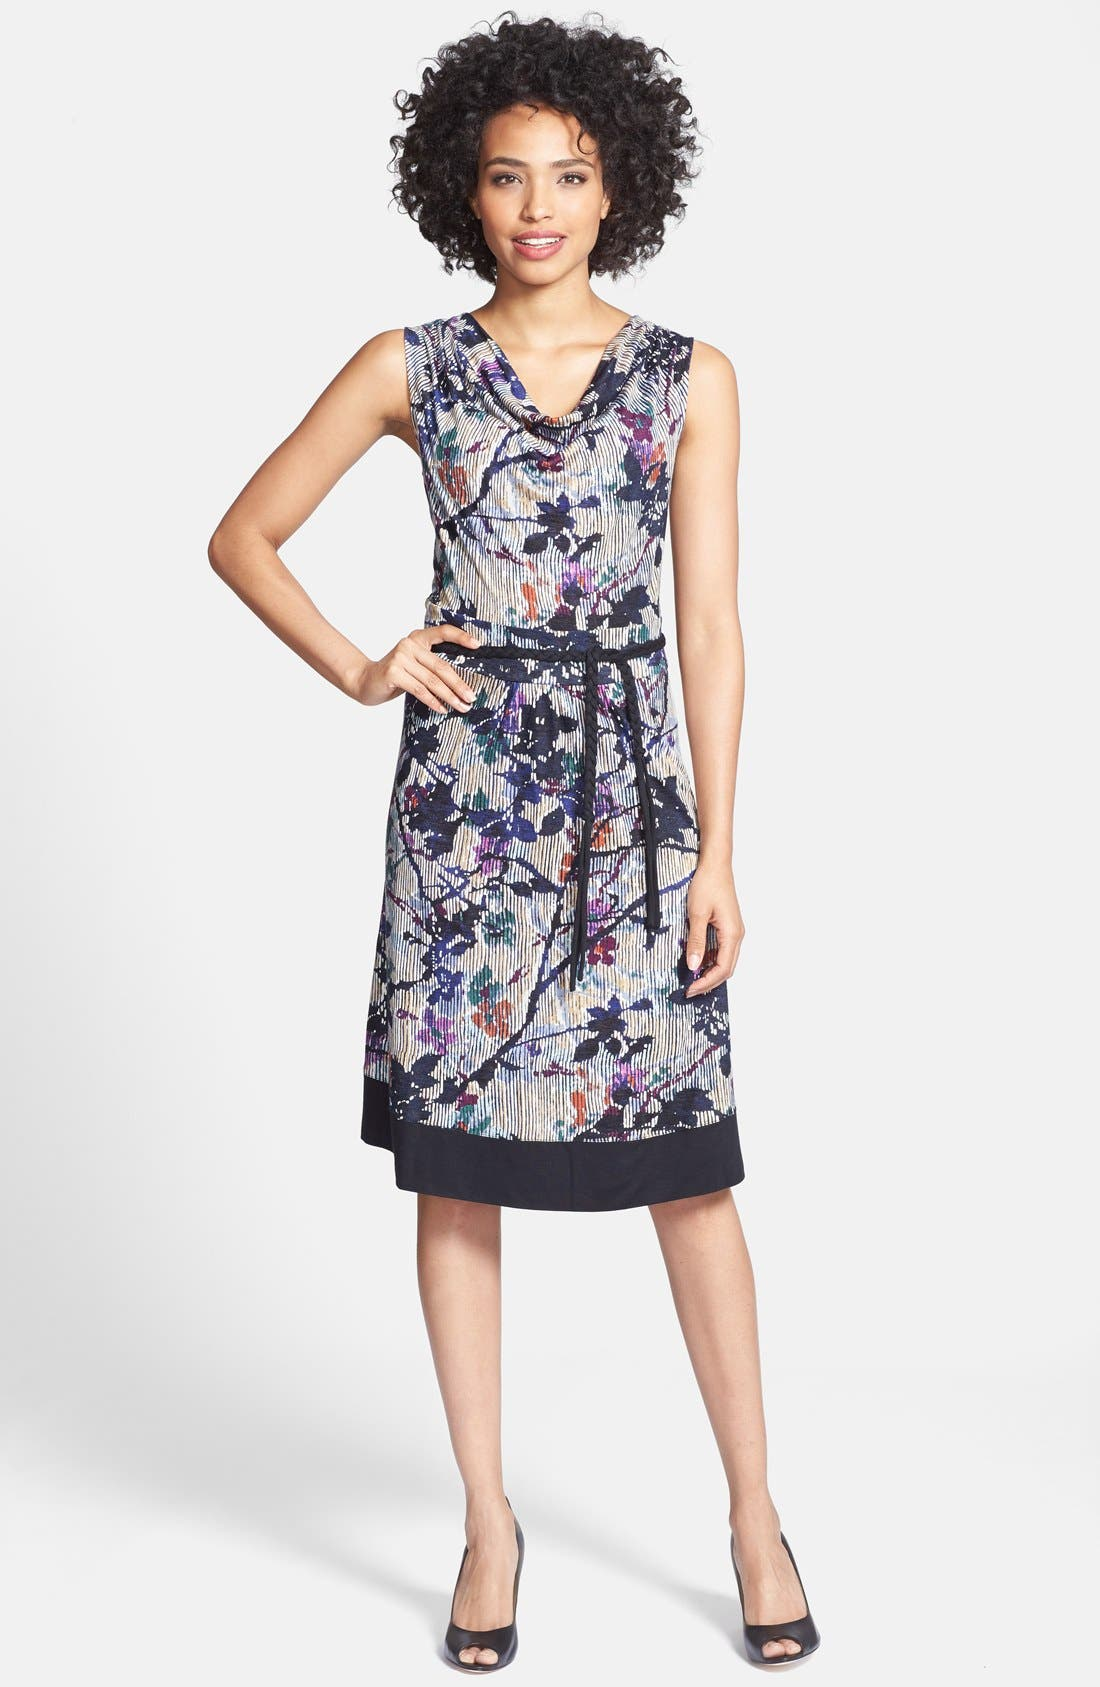 Alternate Image 1 Selected - NIC+ZOE 'Floral Vines' Belted Jersey Dress